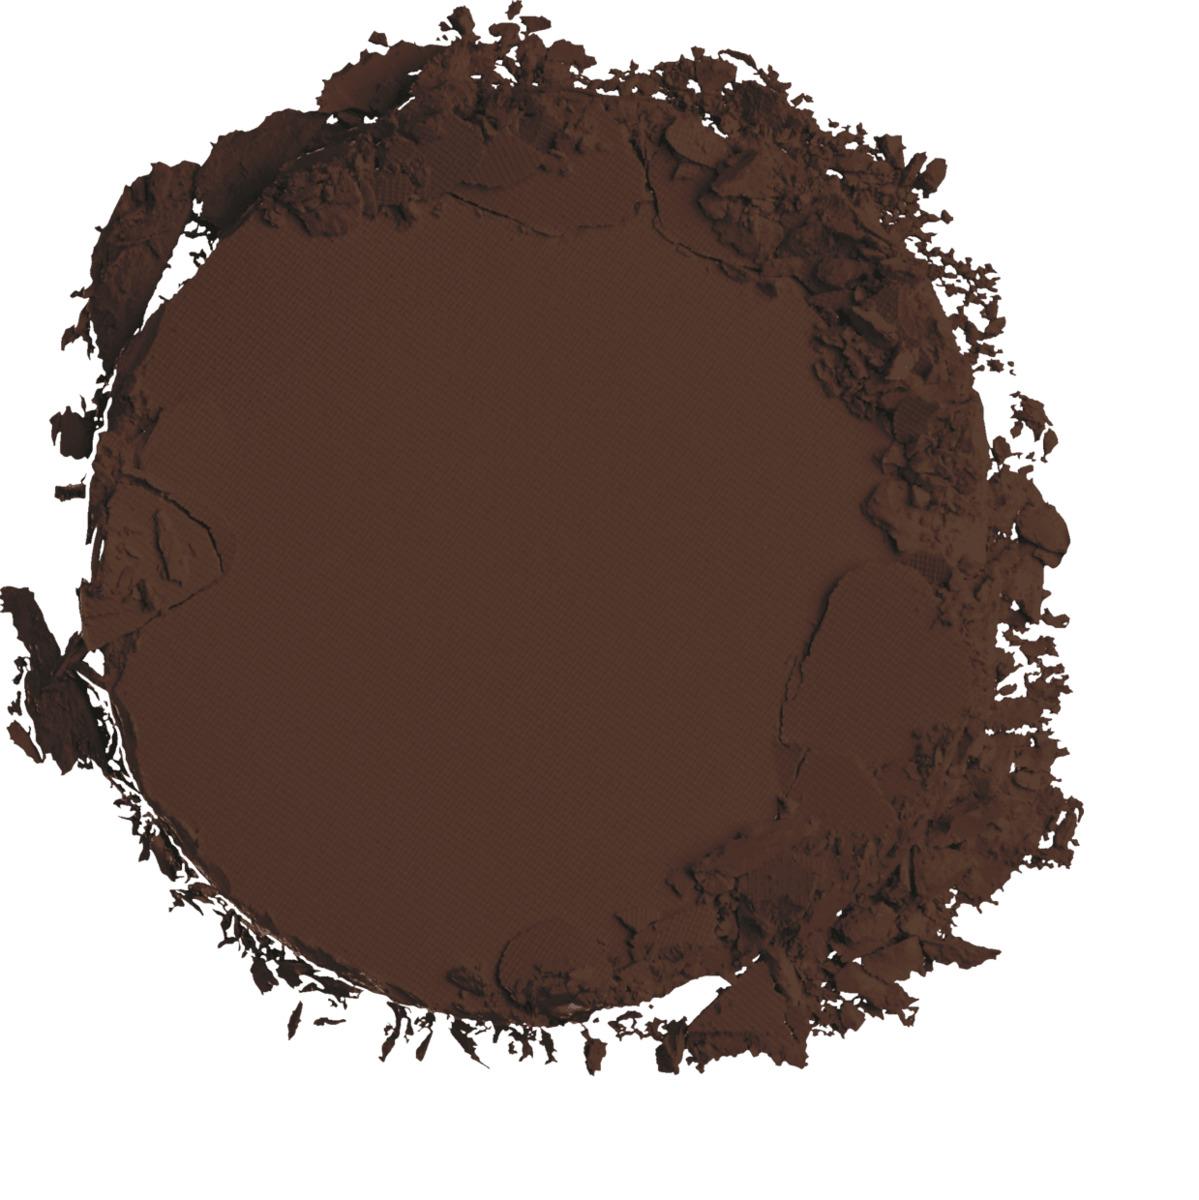 Bild 2 von NYX PROFESSIONAL MAKEUP Foundation Can't Stop Won't Stop Full Coverage Powder Foundation Deep Espresso 24